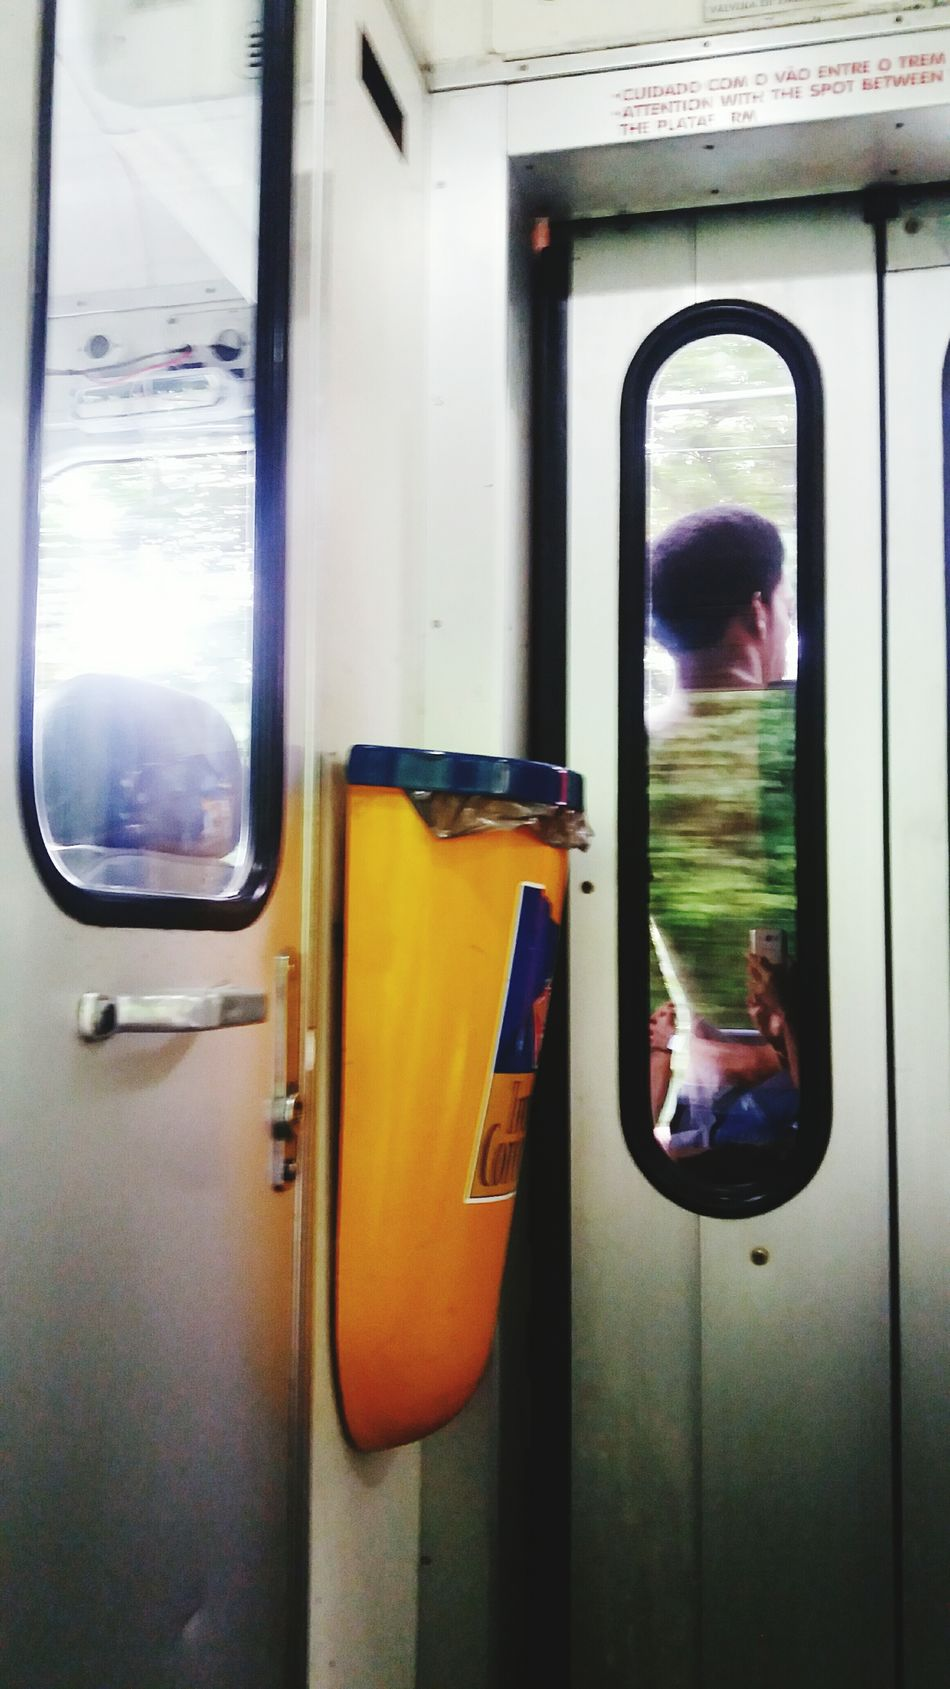 Trem Do Corcovado Corcovado Rio De Janeiro, Brazil People Around You Amazing People Reflection